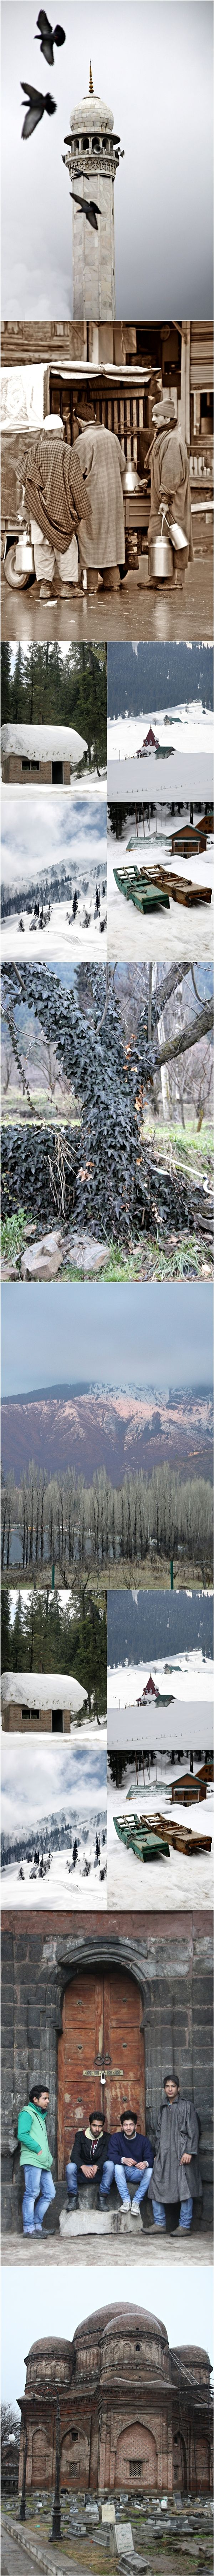 Srinagar, Kashmir #India